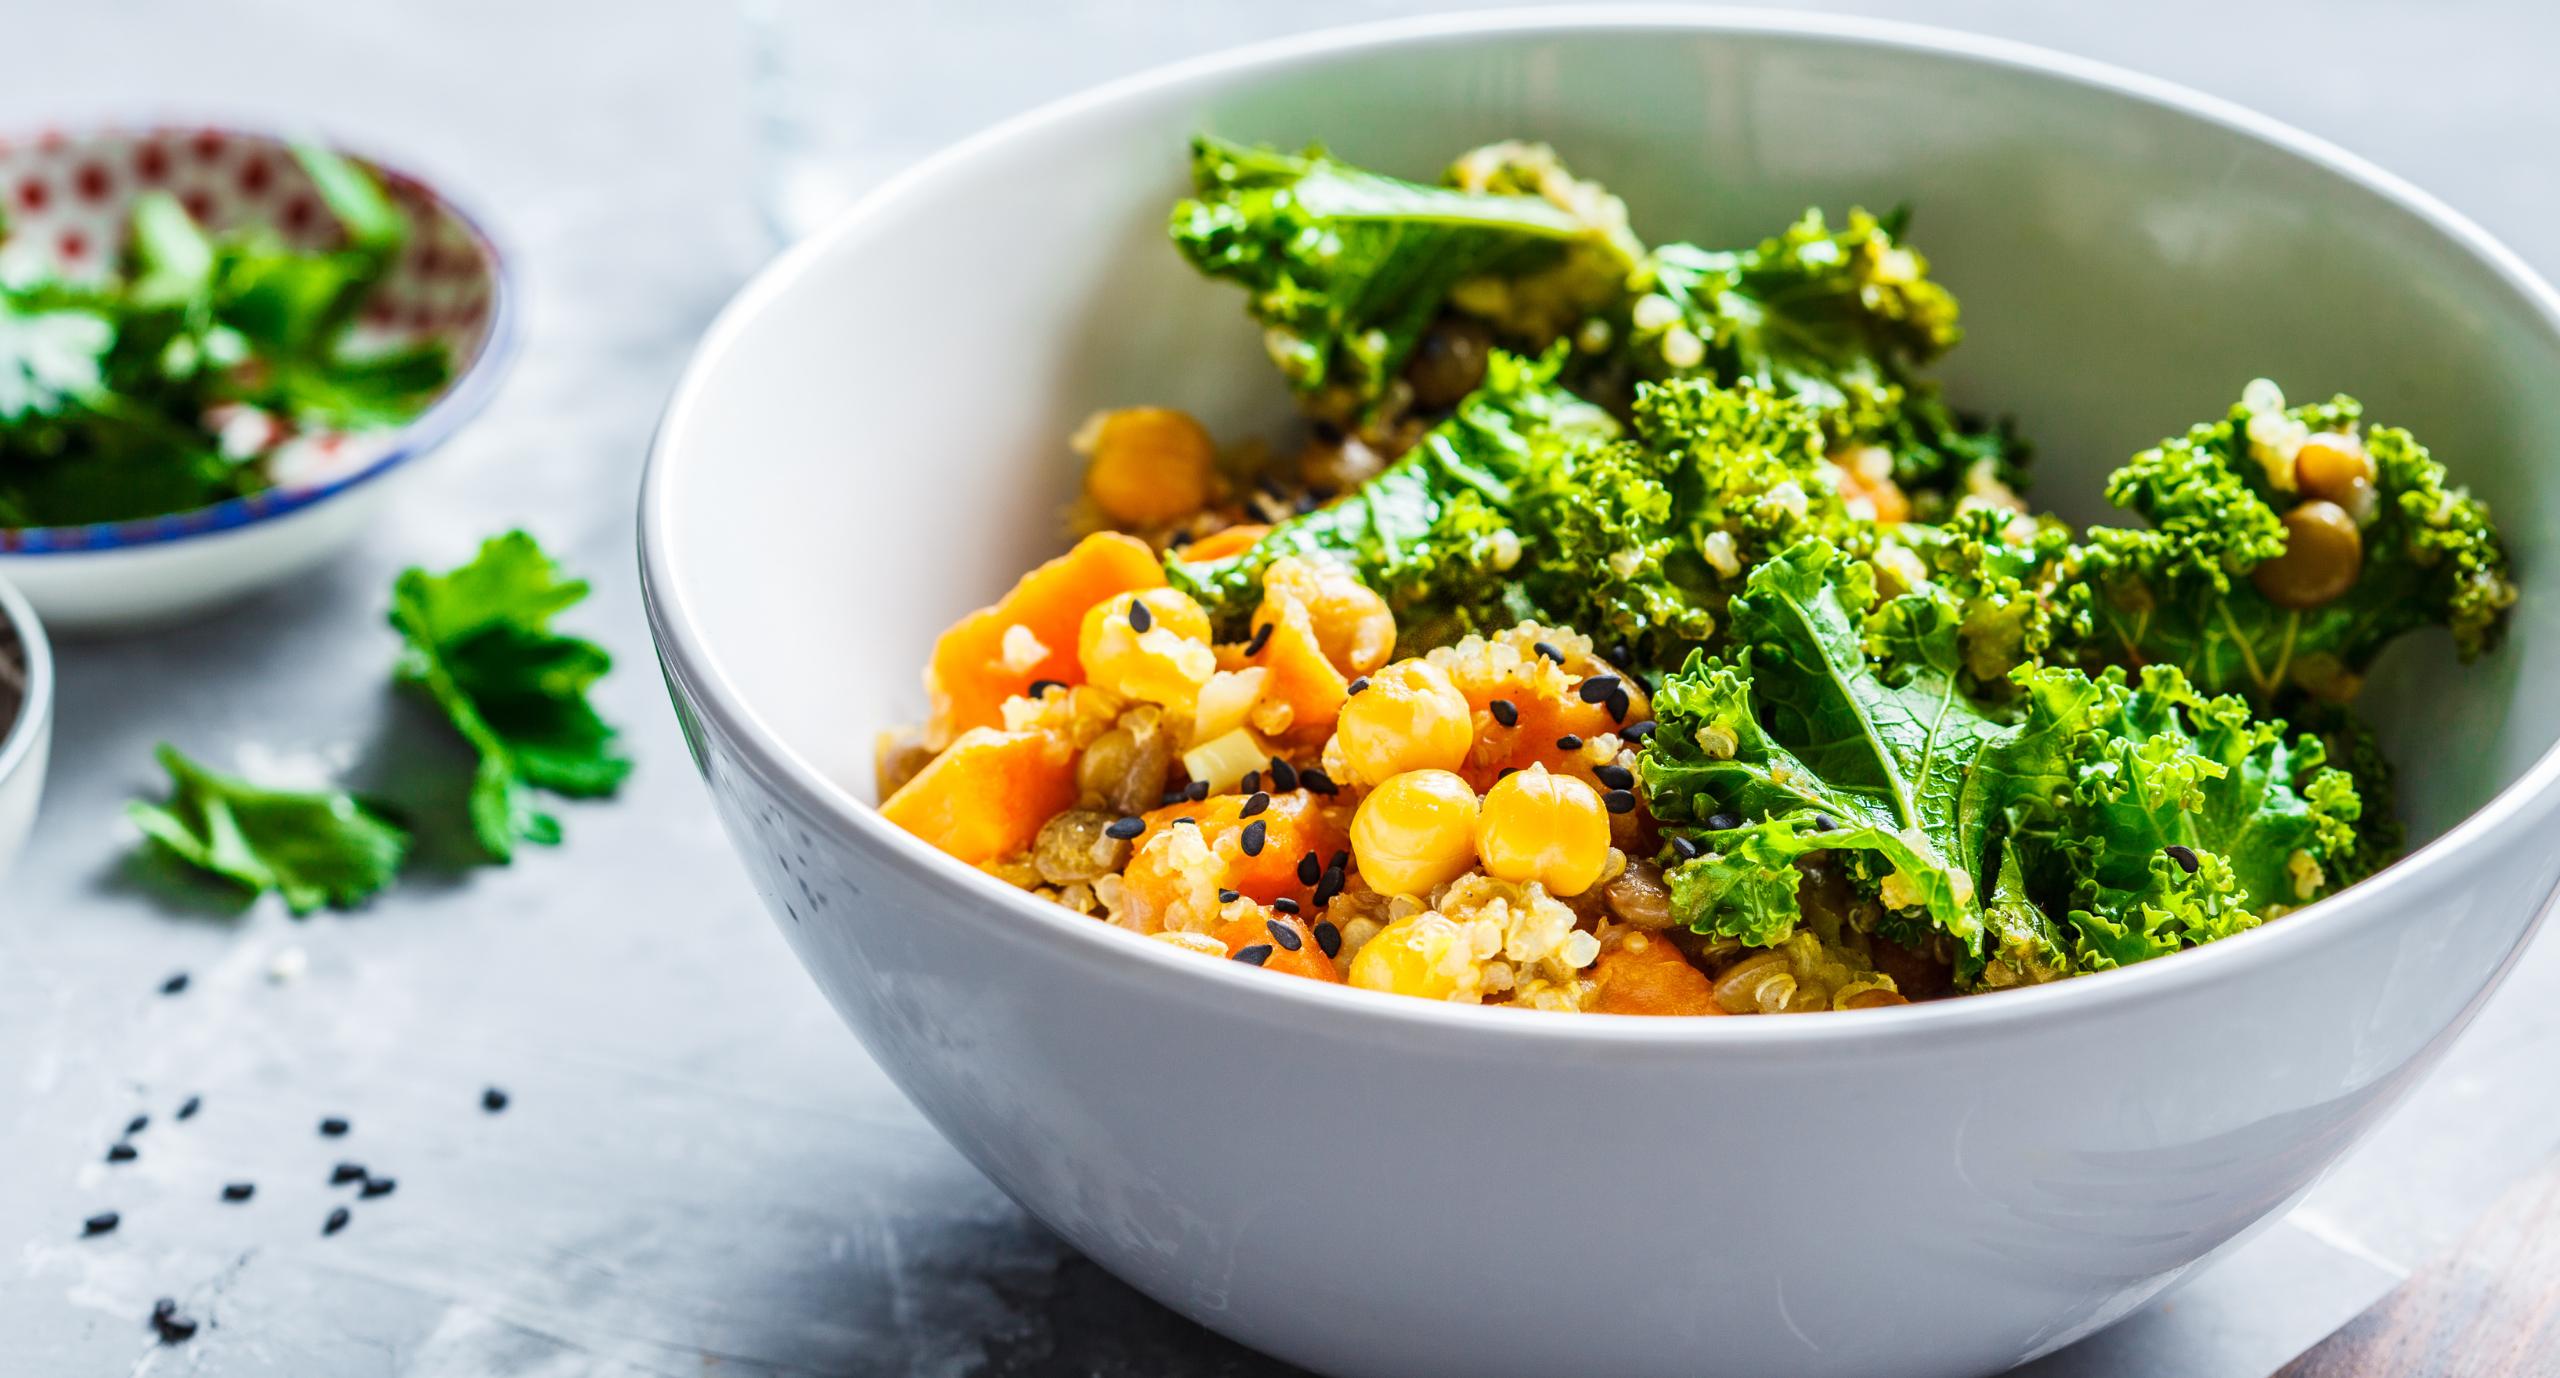 Bæredygtig mad